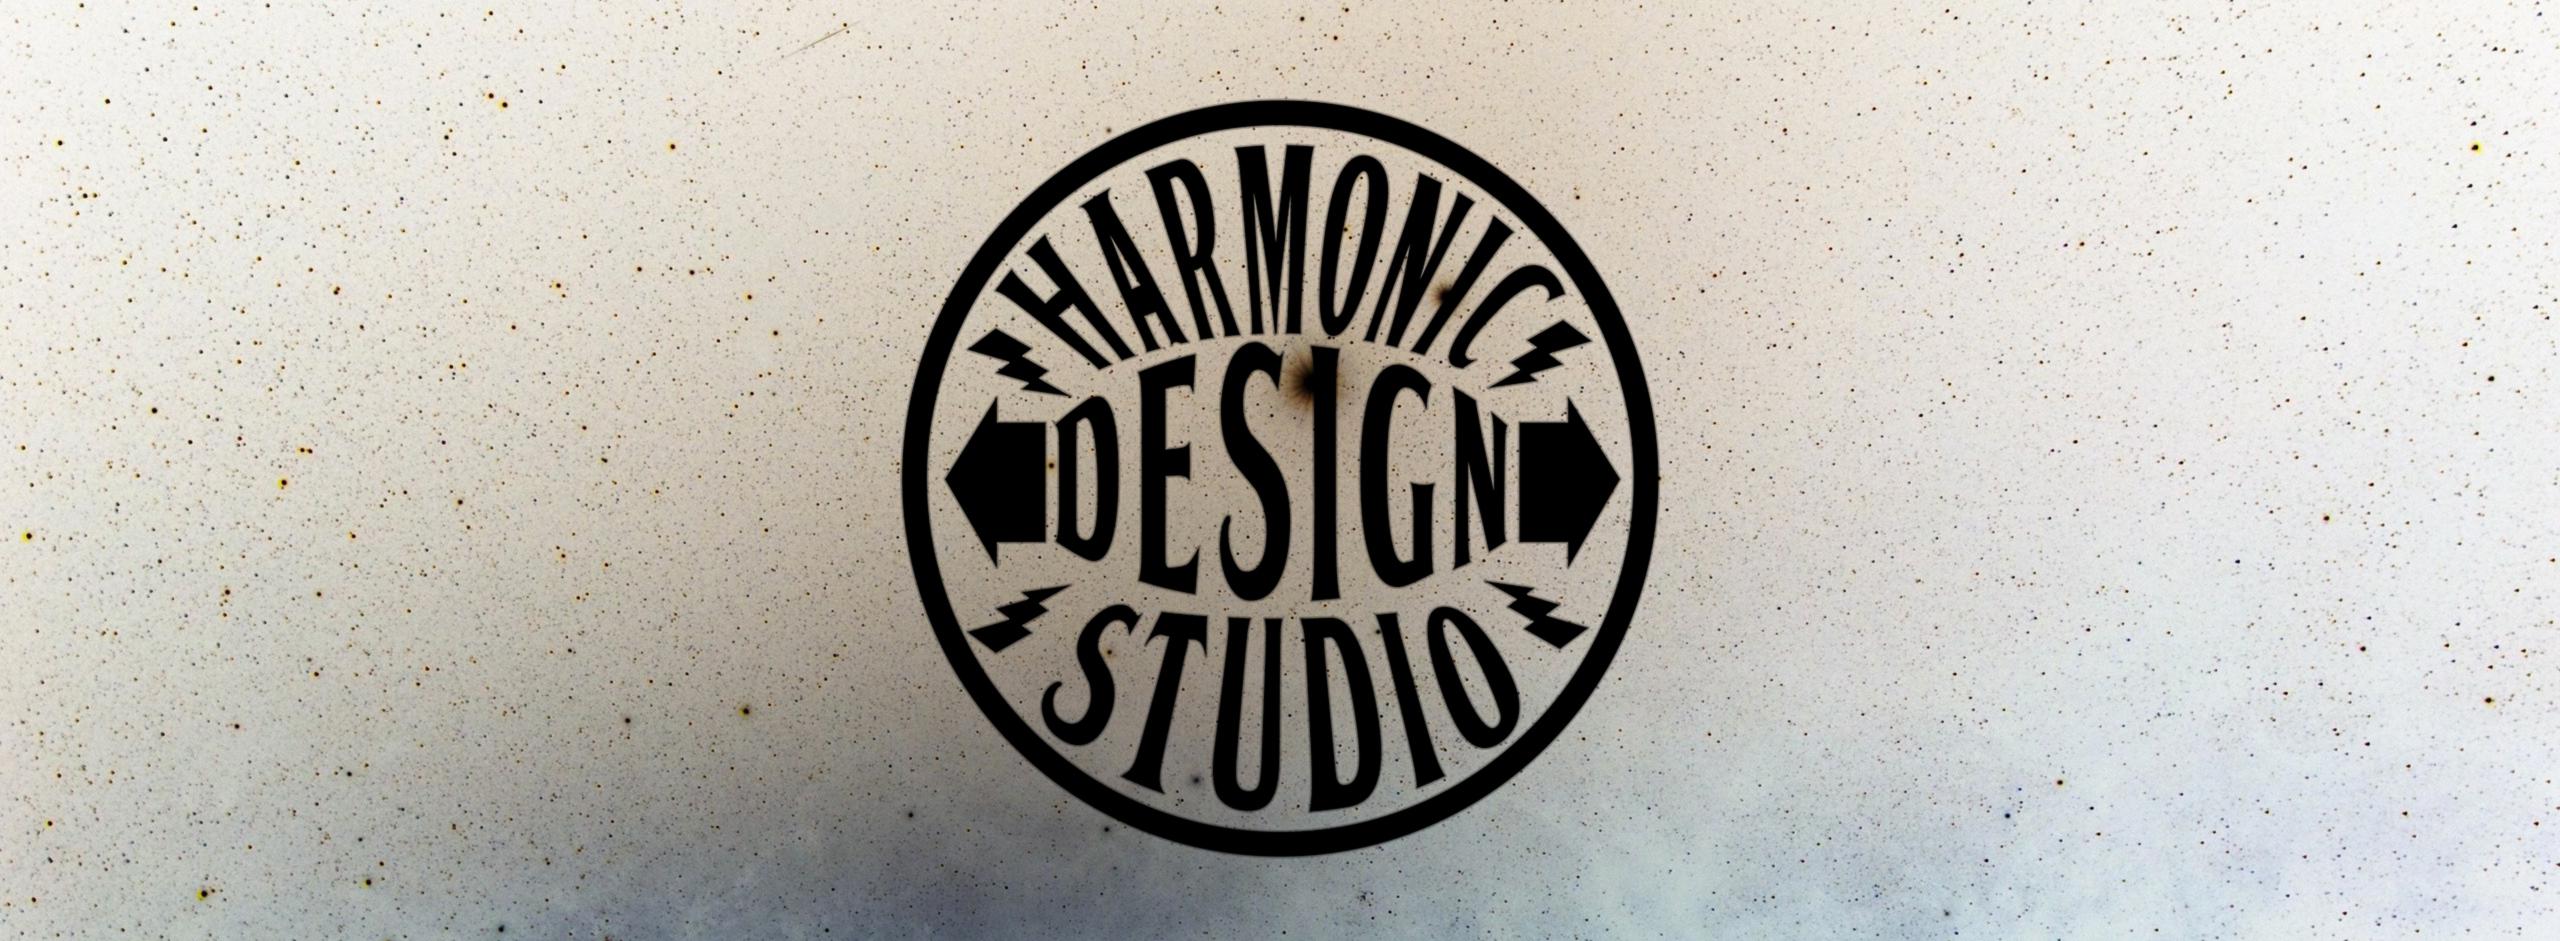 Harmonic-design-studio-wallpaper